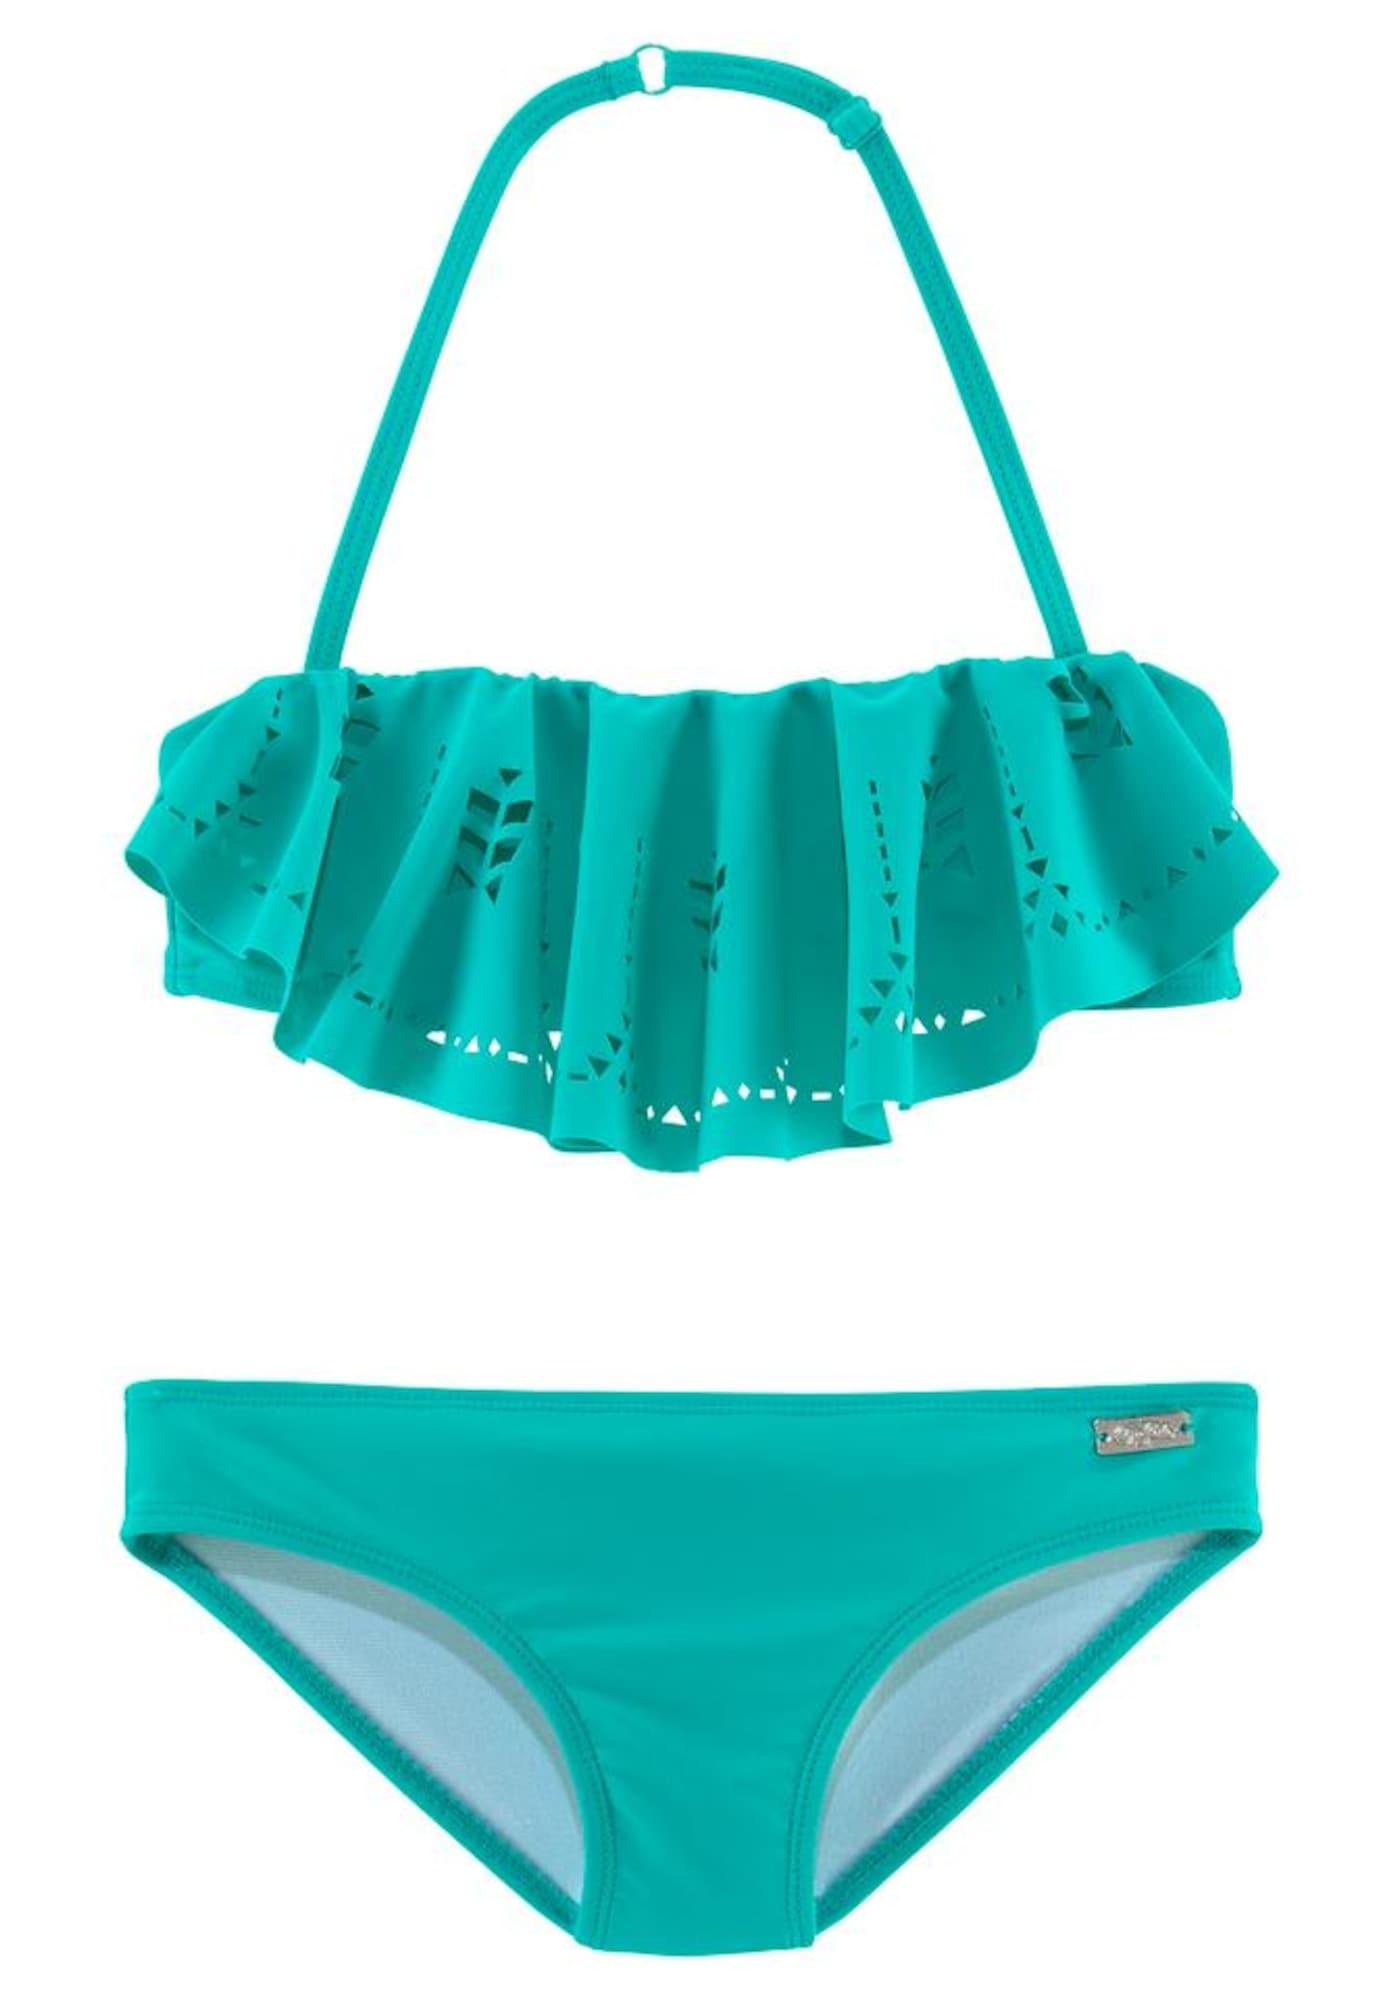 BUFFALO Bikinis 'Split Buf' turkio spalva